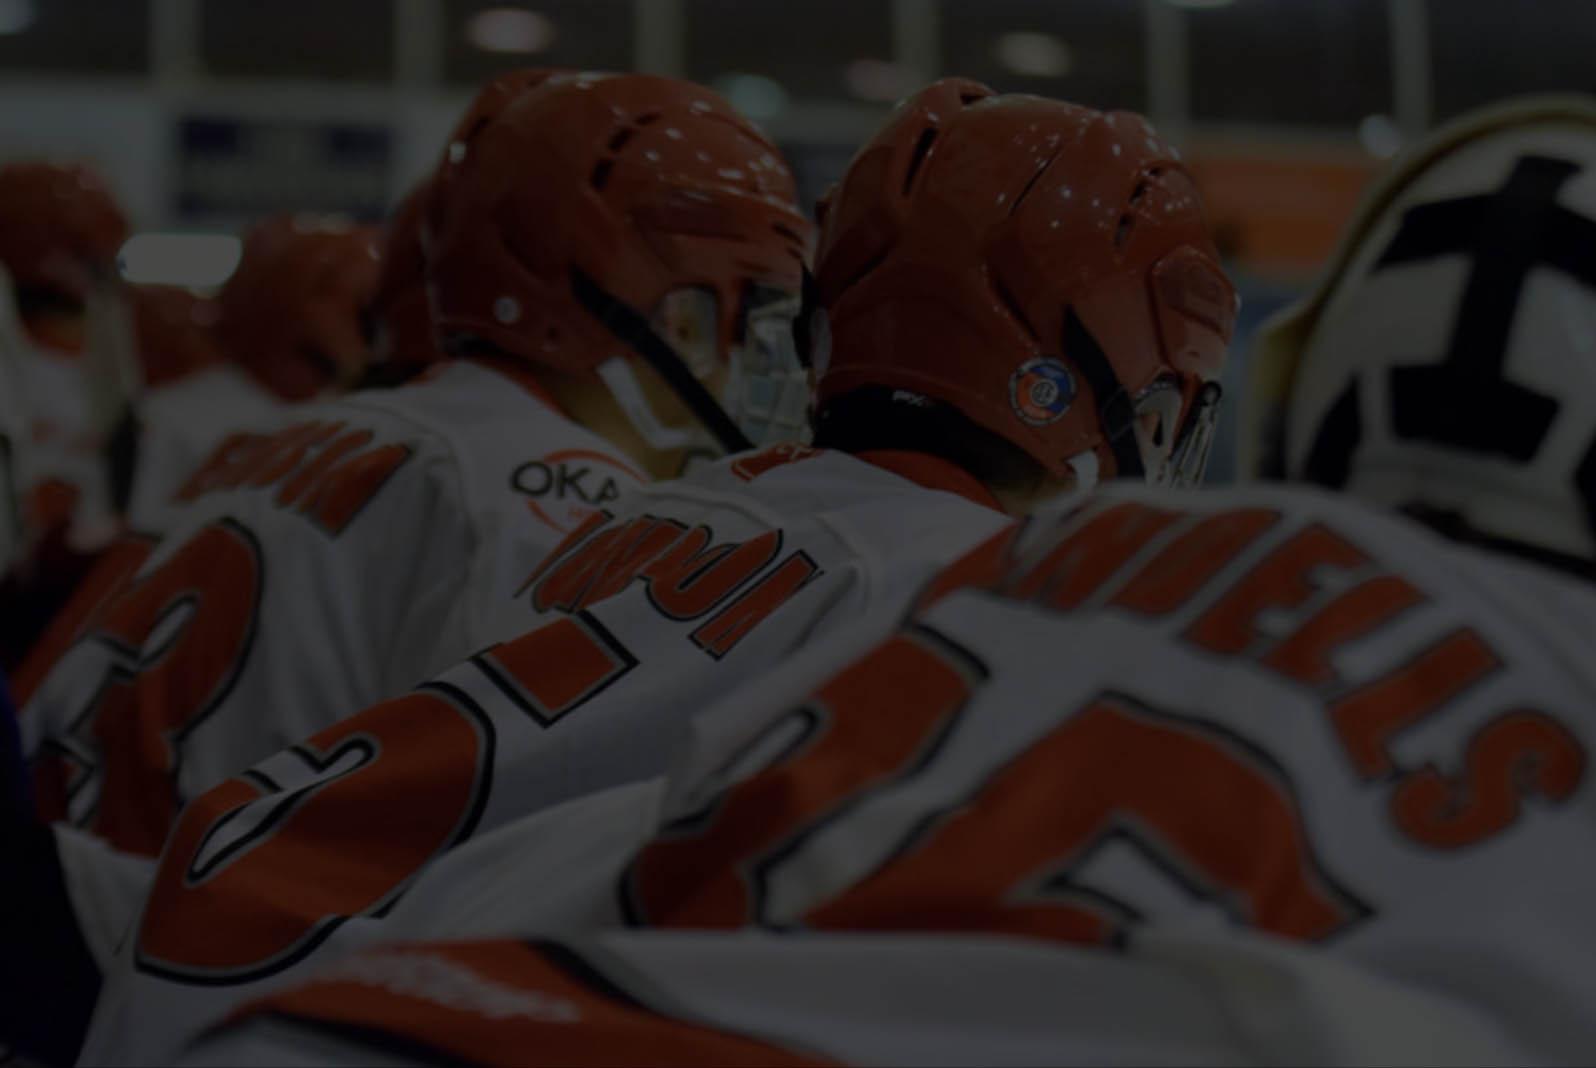 Okanagan Ice Hockey Academy Junior UK team shirts